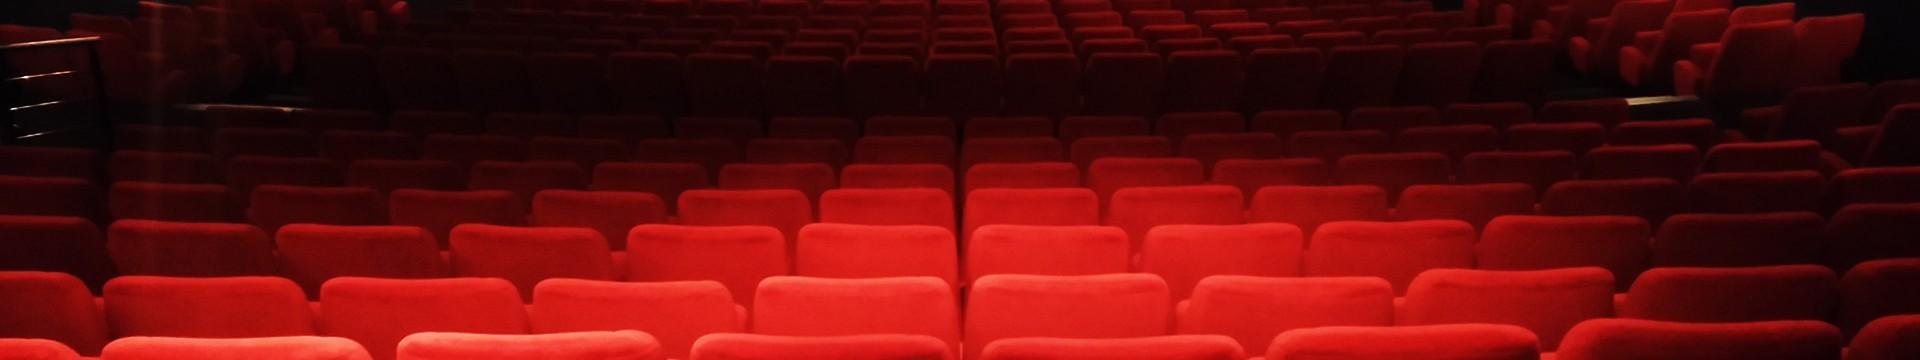 cinema-01-8956